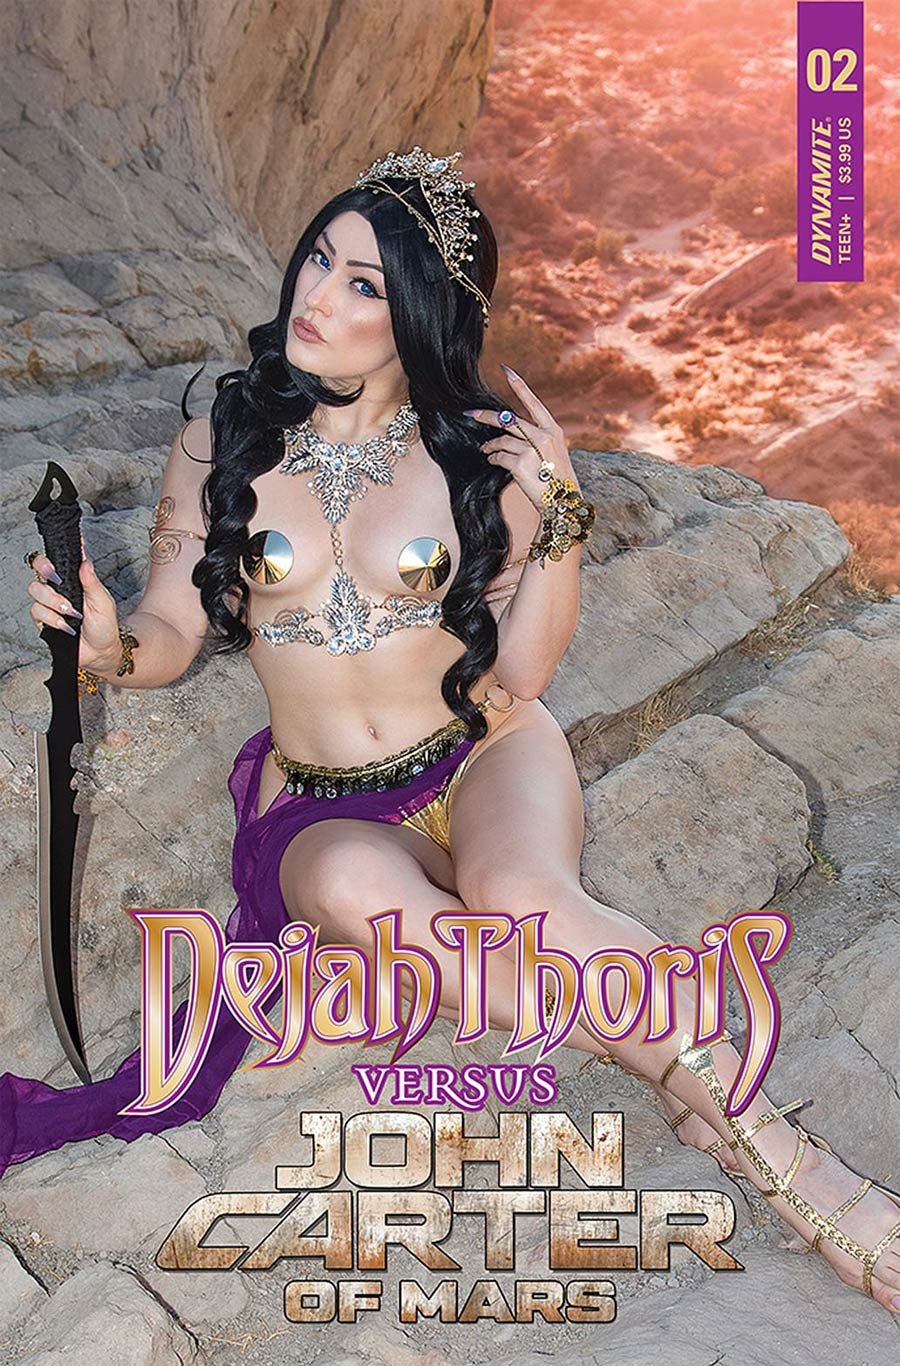 Dejah Thoris Versus John Carter Of Mars #2 Cover D Variant Rachel Hollon Cosplay Photo Cover